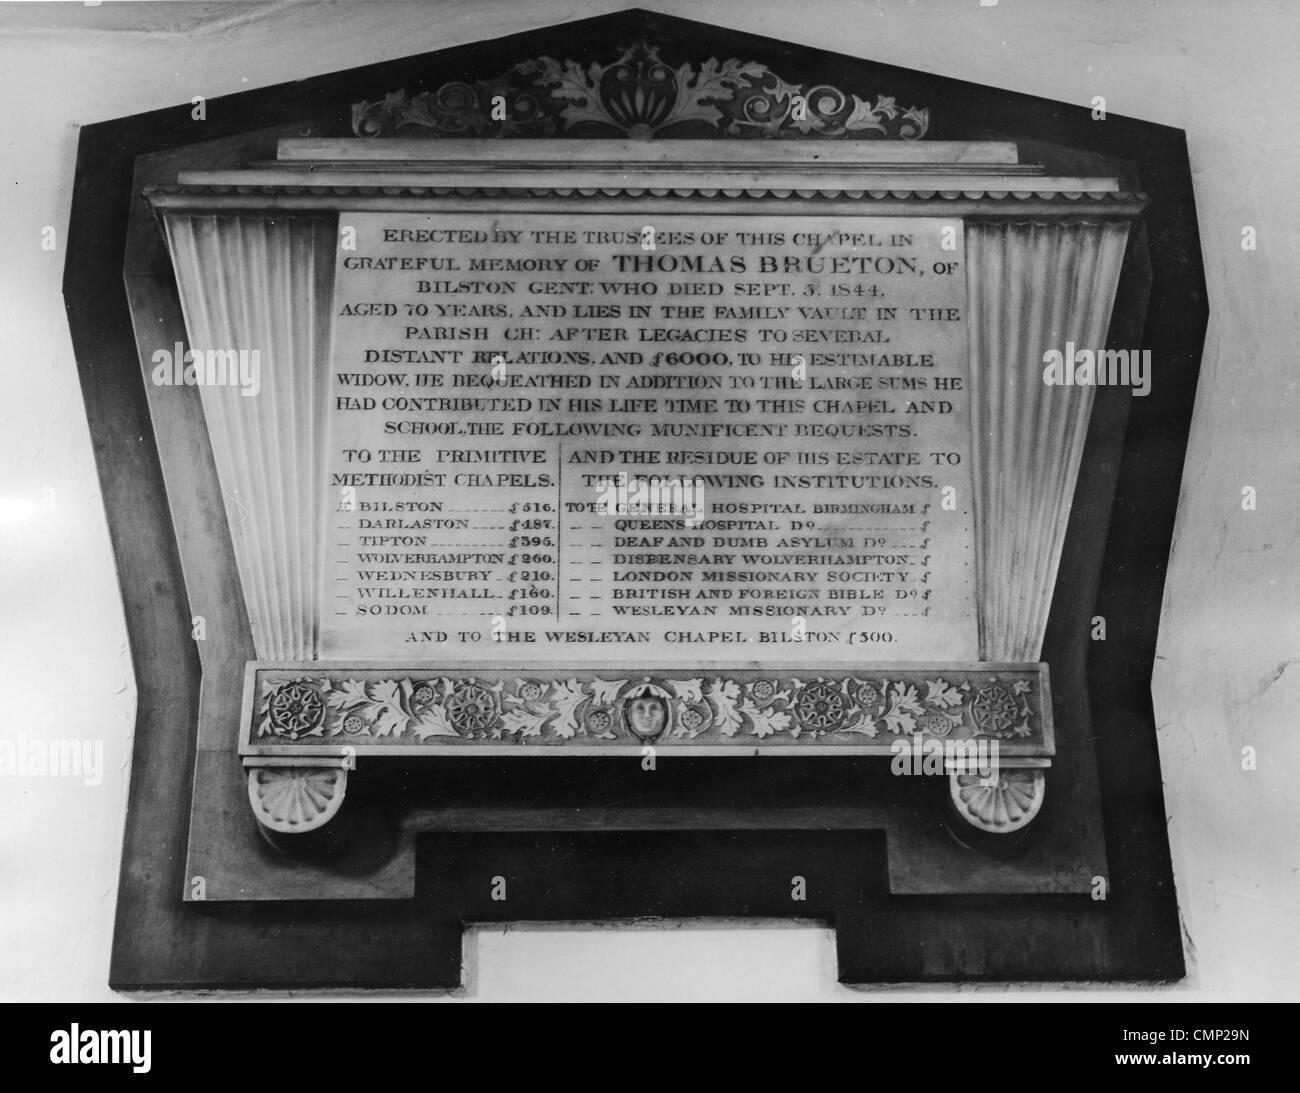 Brueton Memorial, High Street Primitive Methodist Chapel, Bilston, 23124. Memorial plaque in memory of Thomas Brueton, - Stock Image